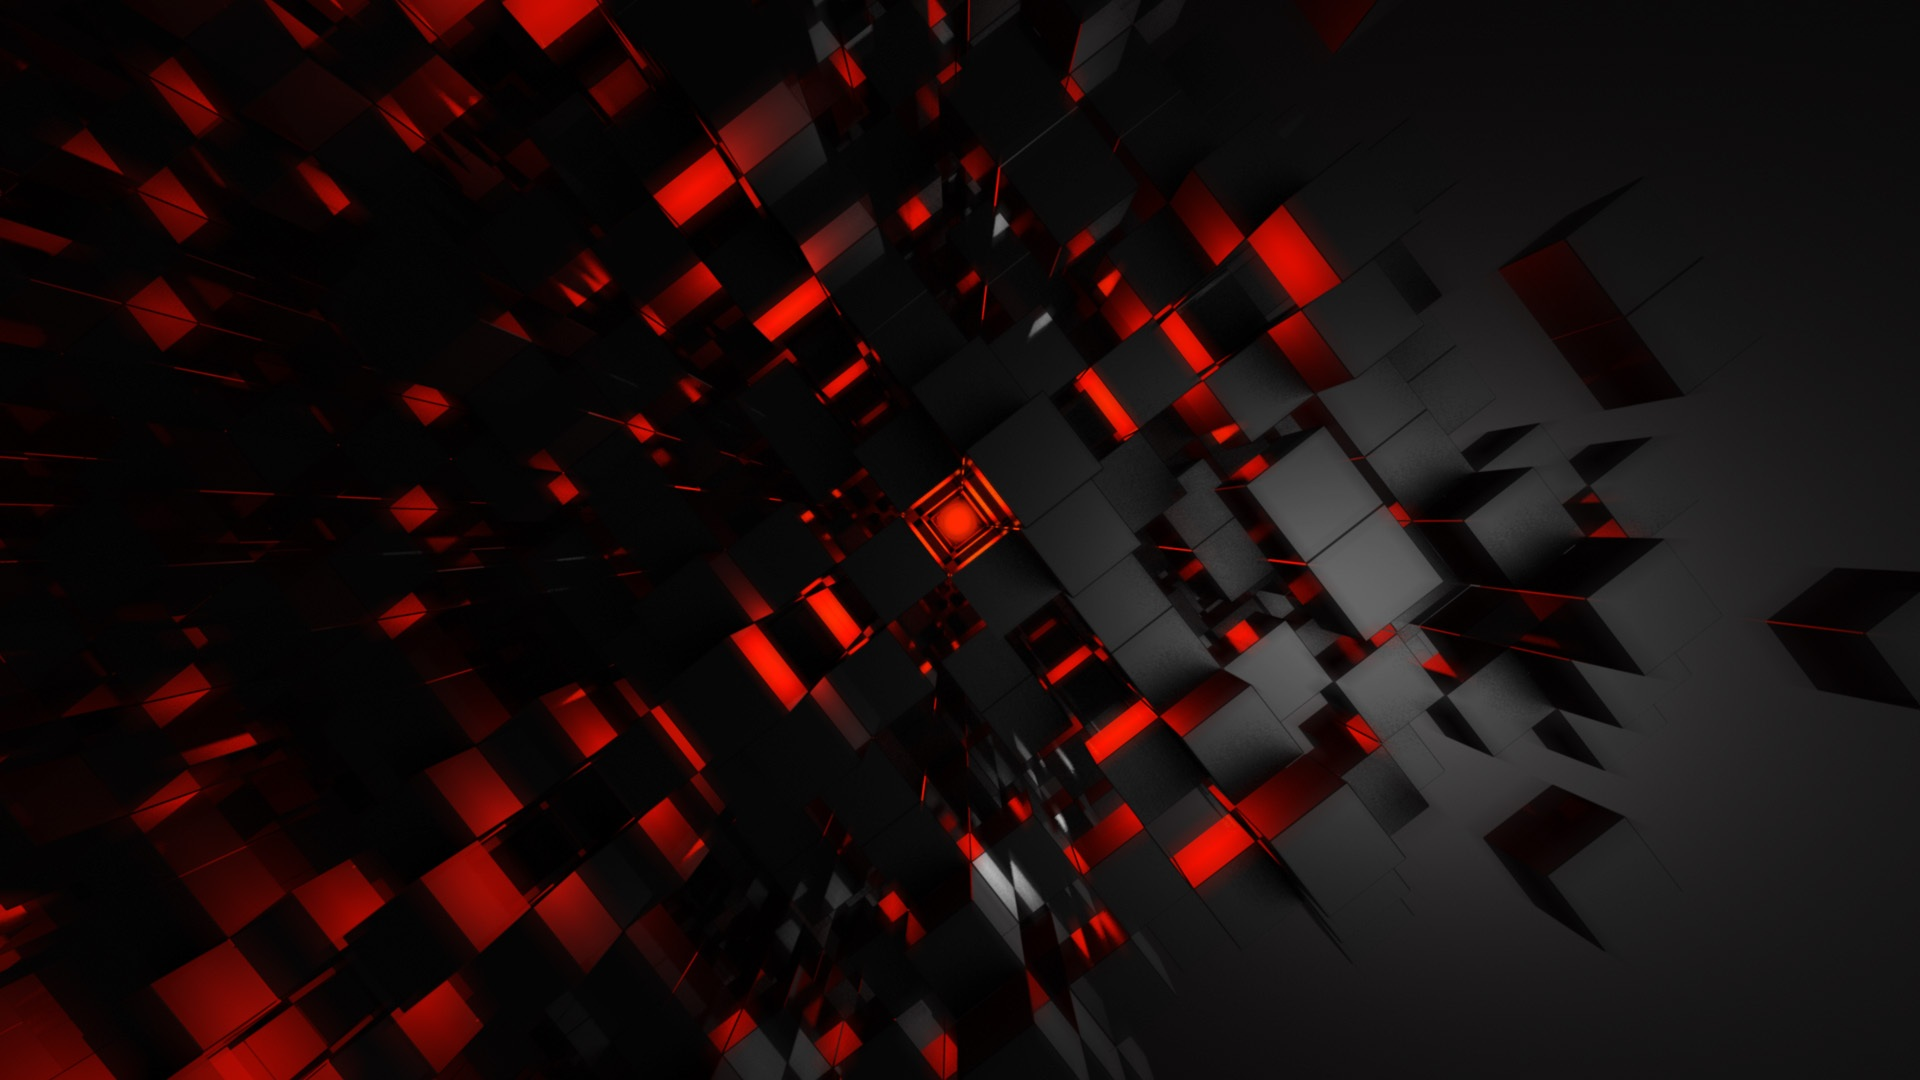 3d Smoke Wallpaper Abstract Neon Wallpapers Hd Pixelstalk Net